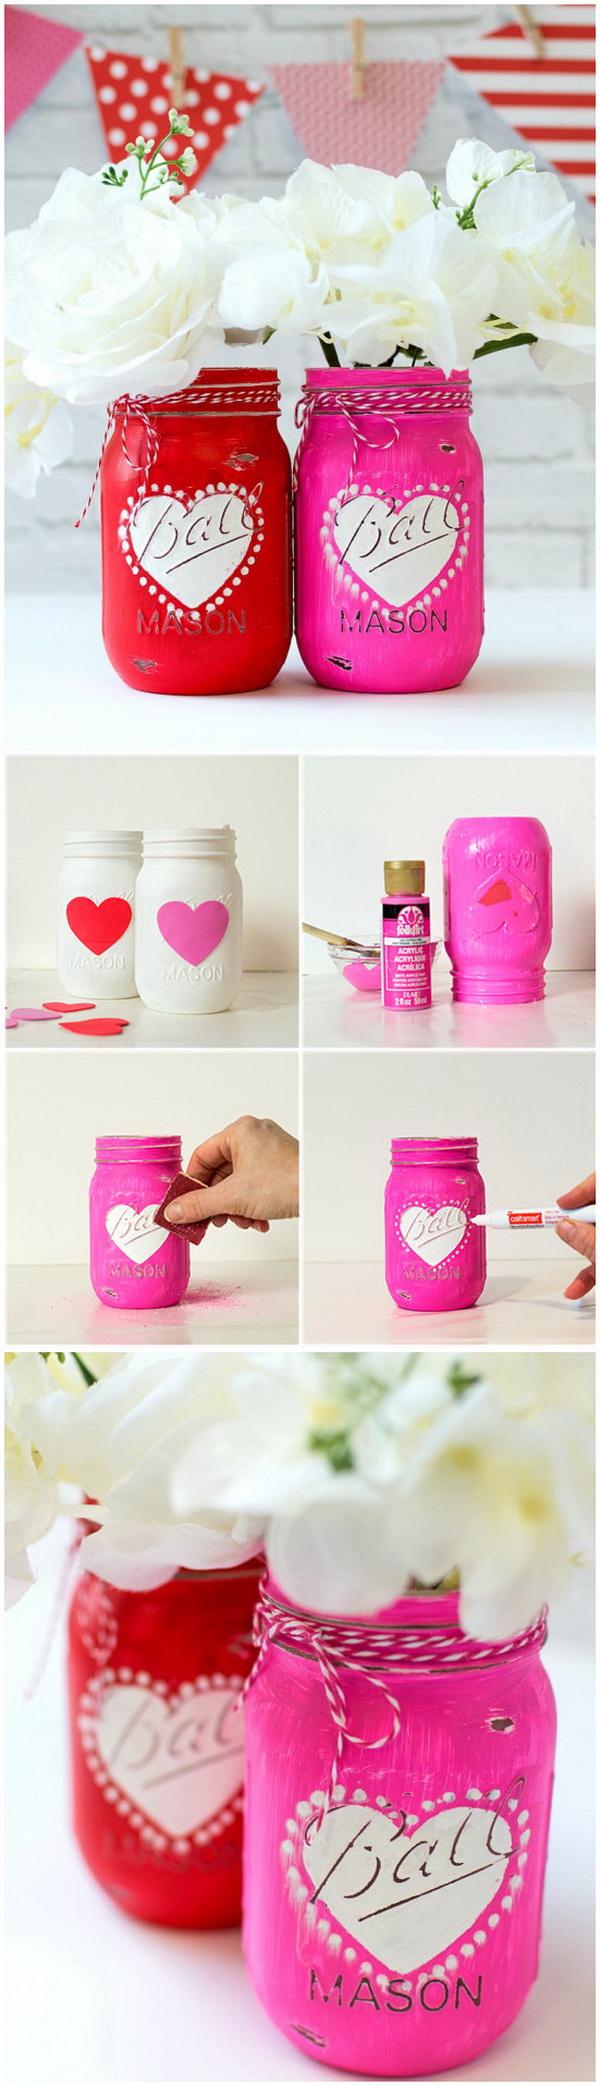 Heart Jar Craft.